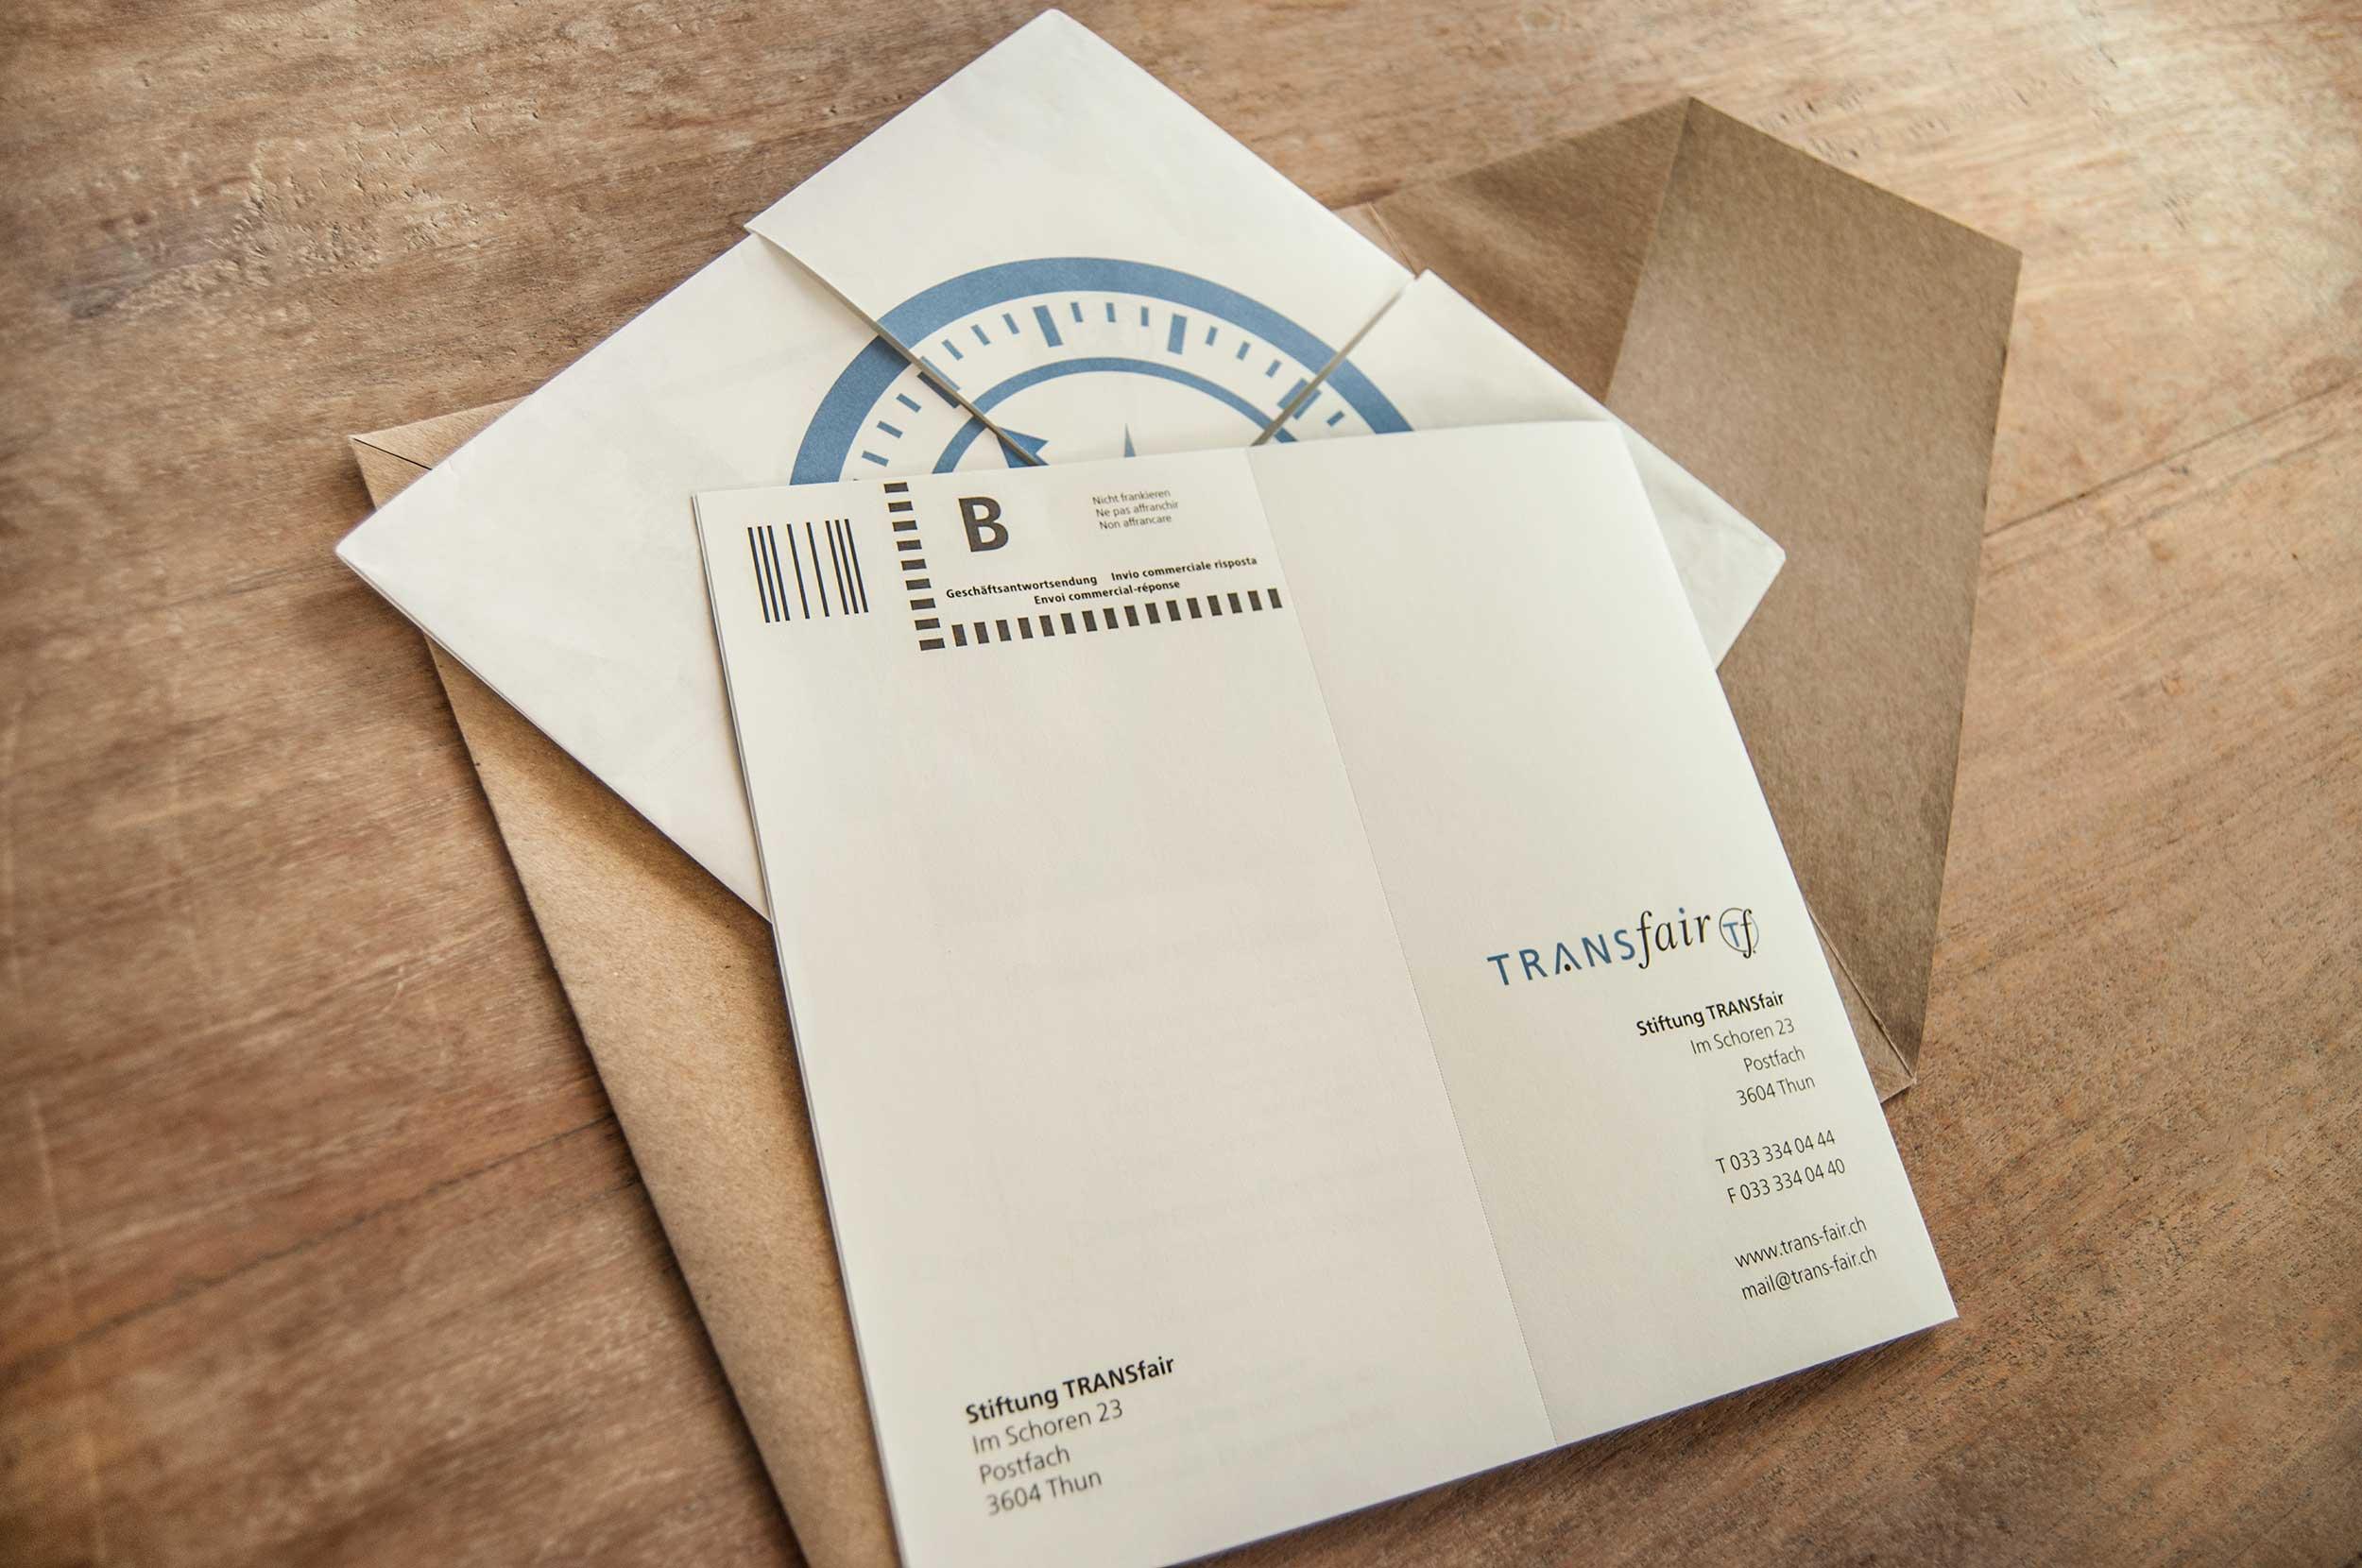 Foundation TRANSfair invitation card GPU Desiagn